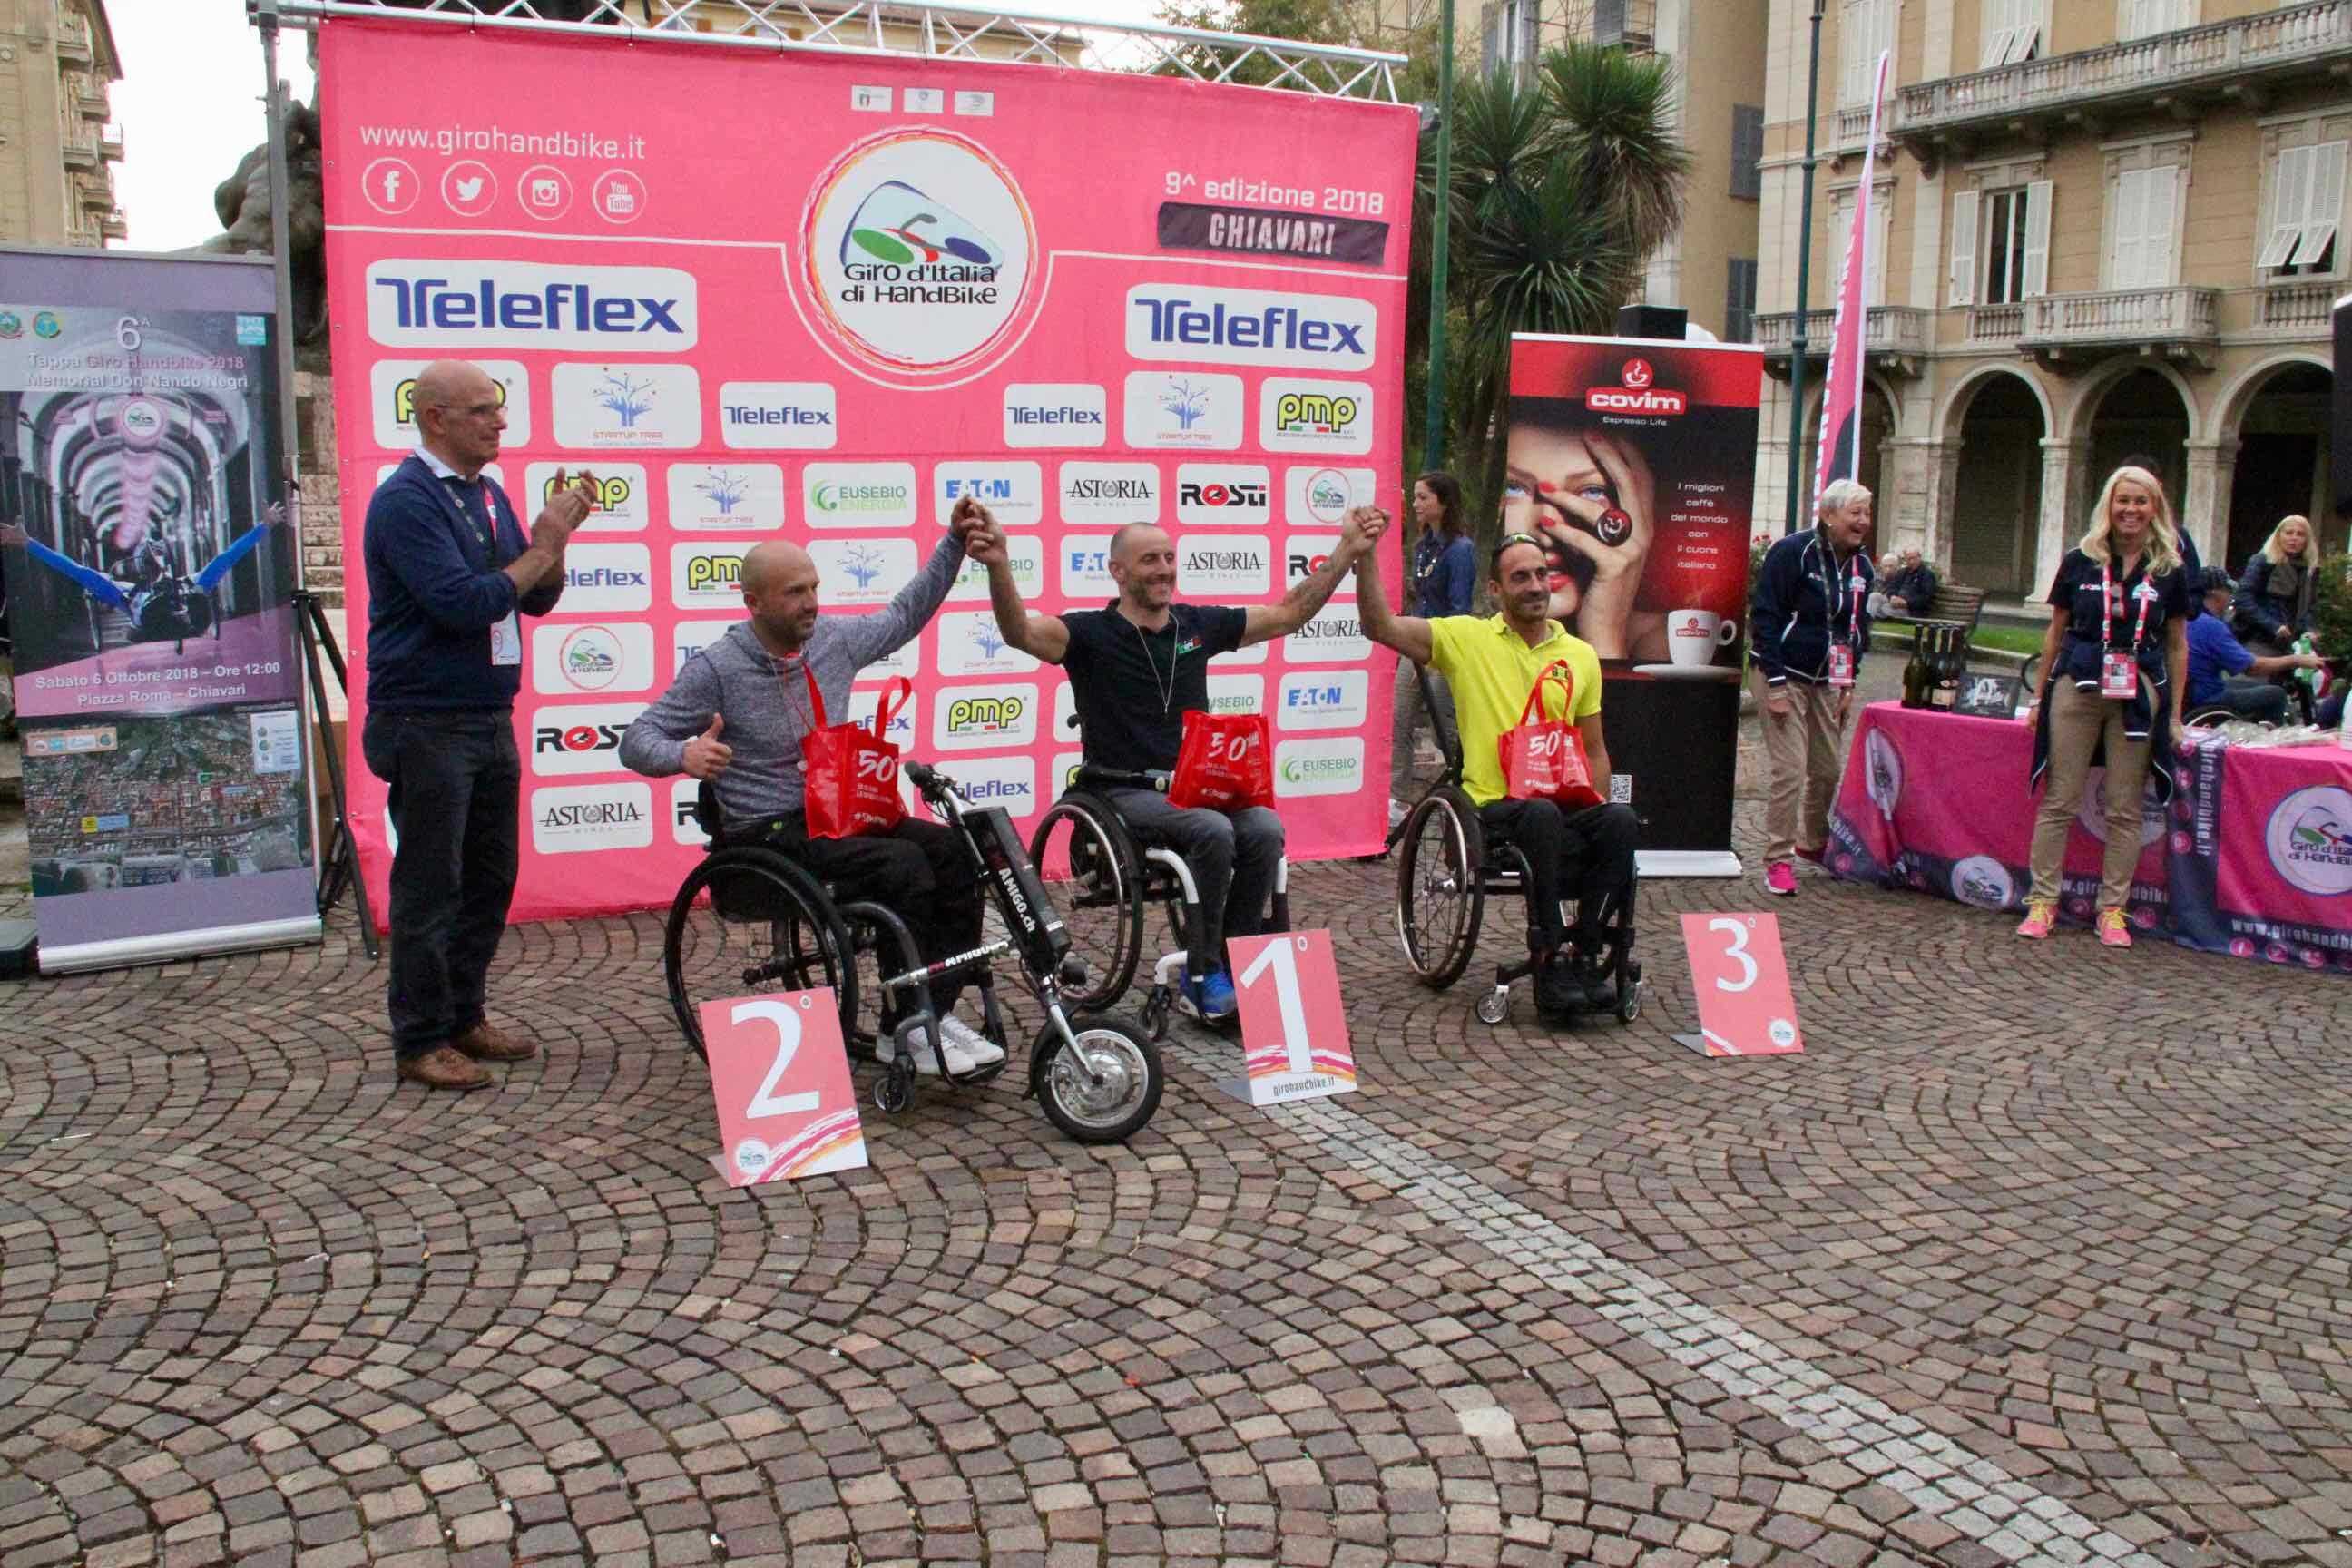 1° Memorial don Nando Negri a Chiavari per il Giro d'Italia Handbike 2018 - 21